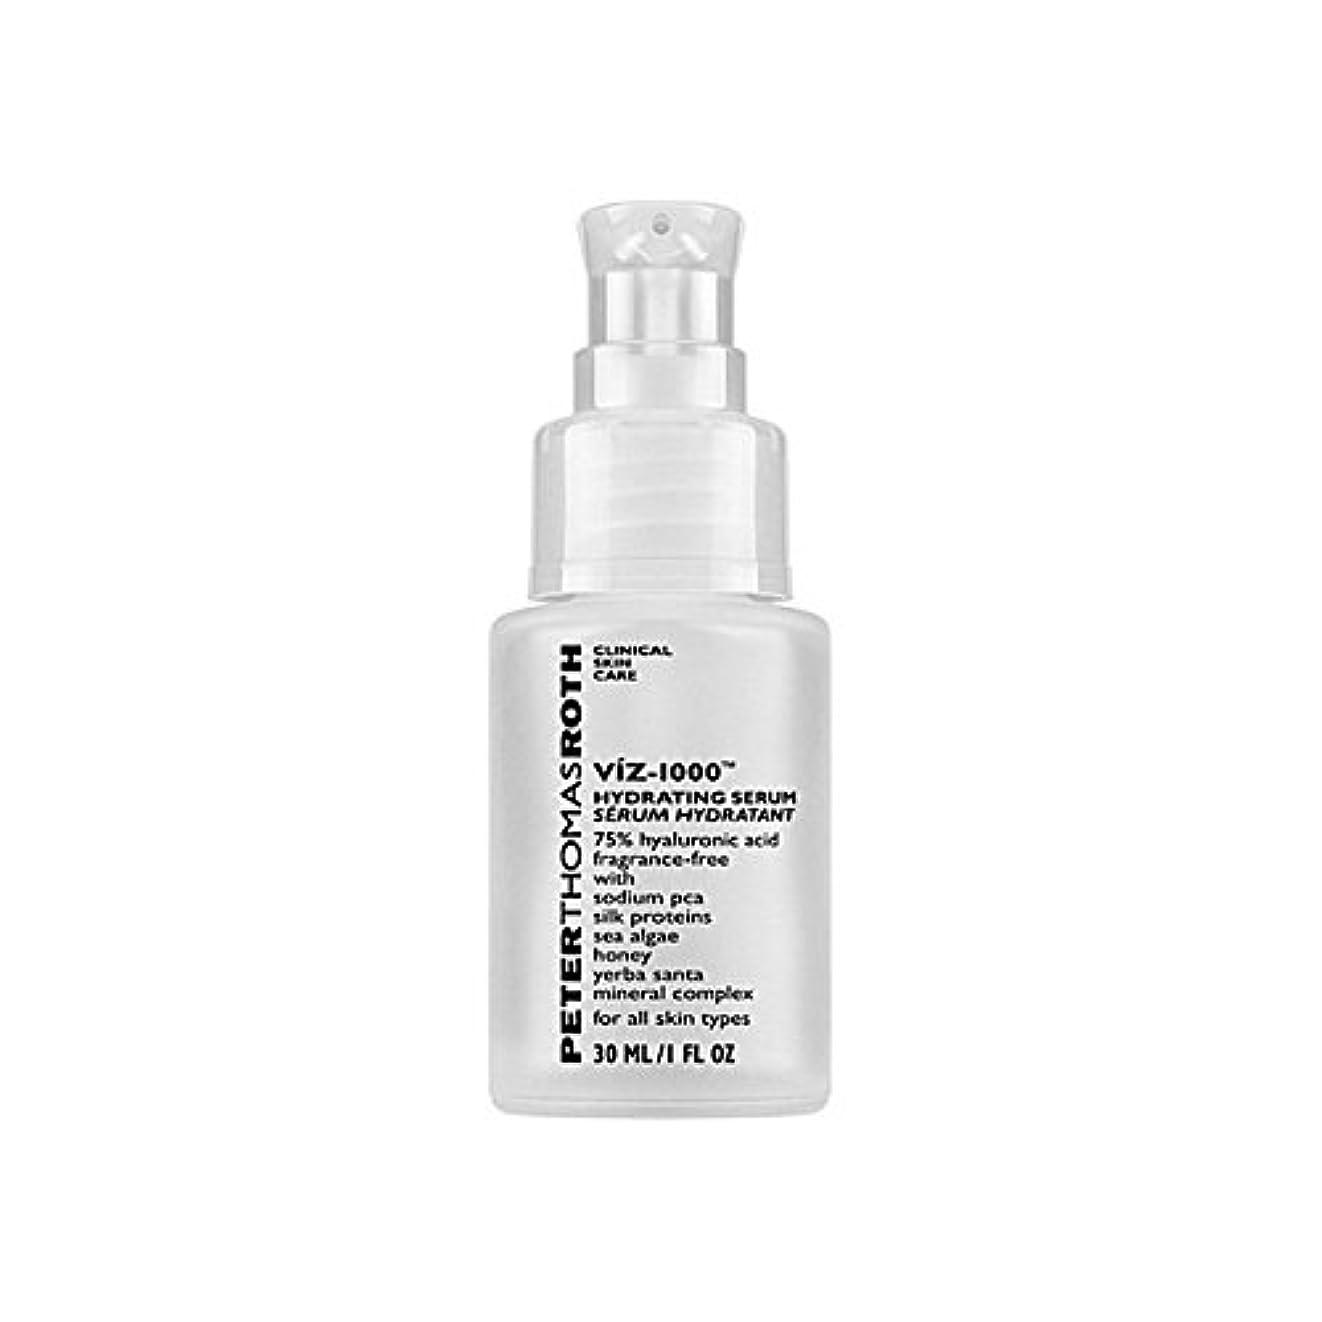 Peter Thomas Roth Viz-1000 Hydrating Serum 30Ml - ピーター?トーマス?ロスすなわち-1000水和セラム30 [並行輸入品]